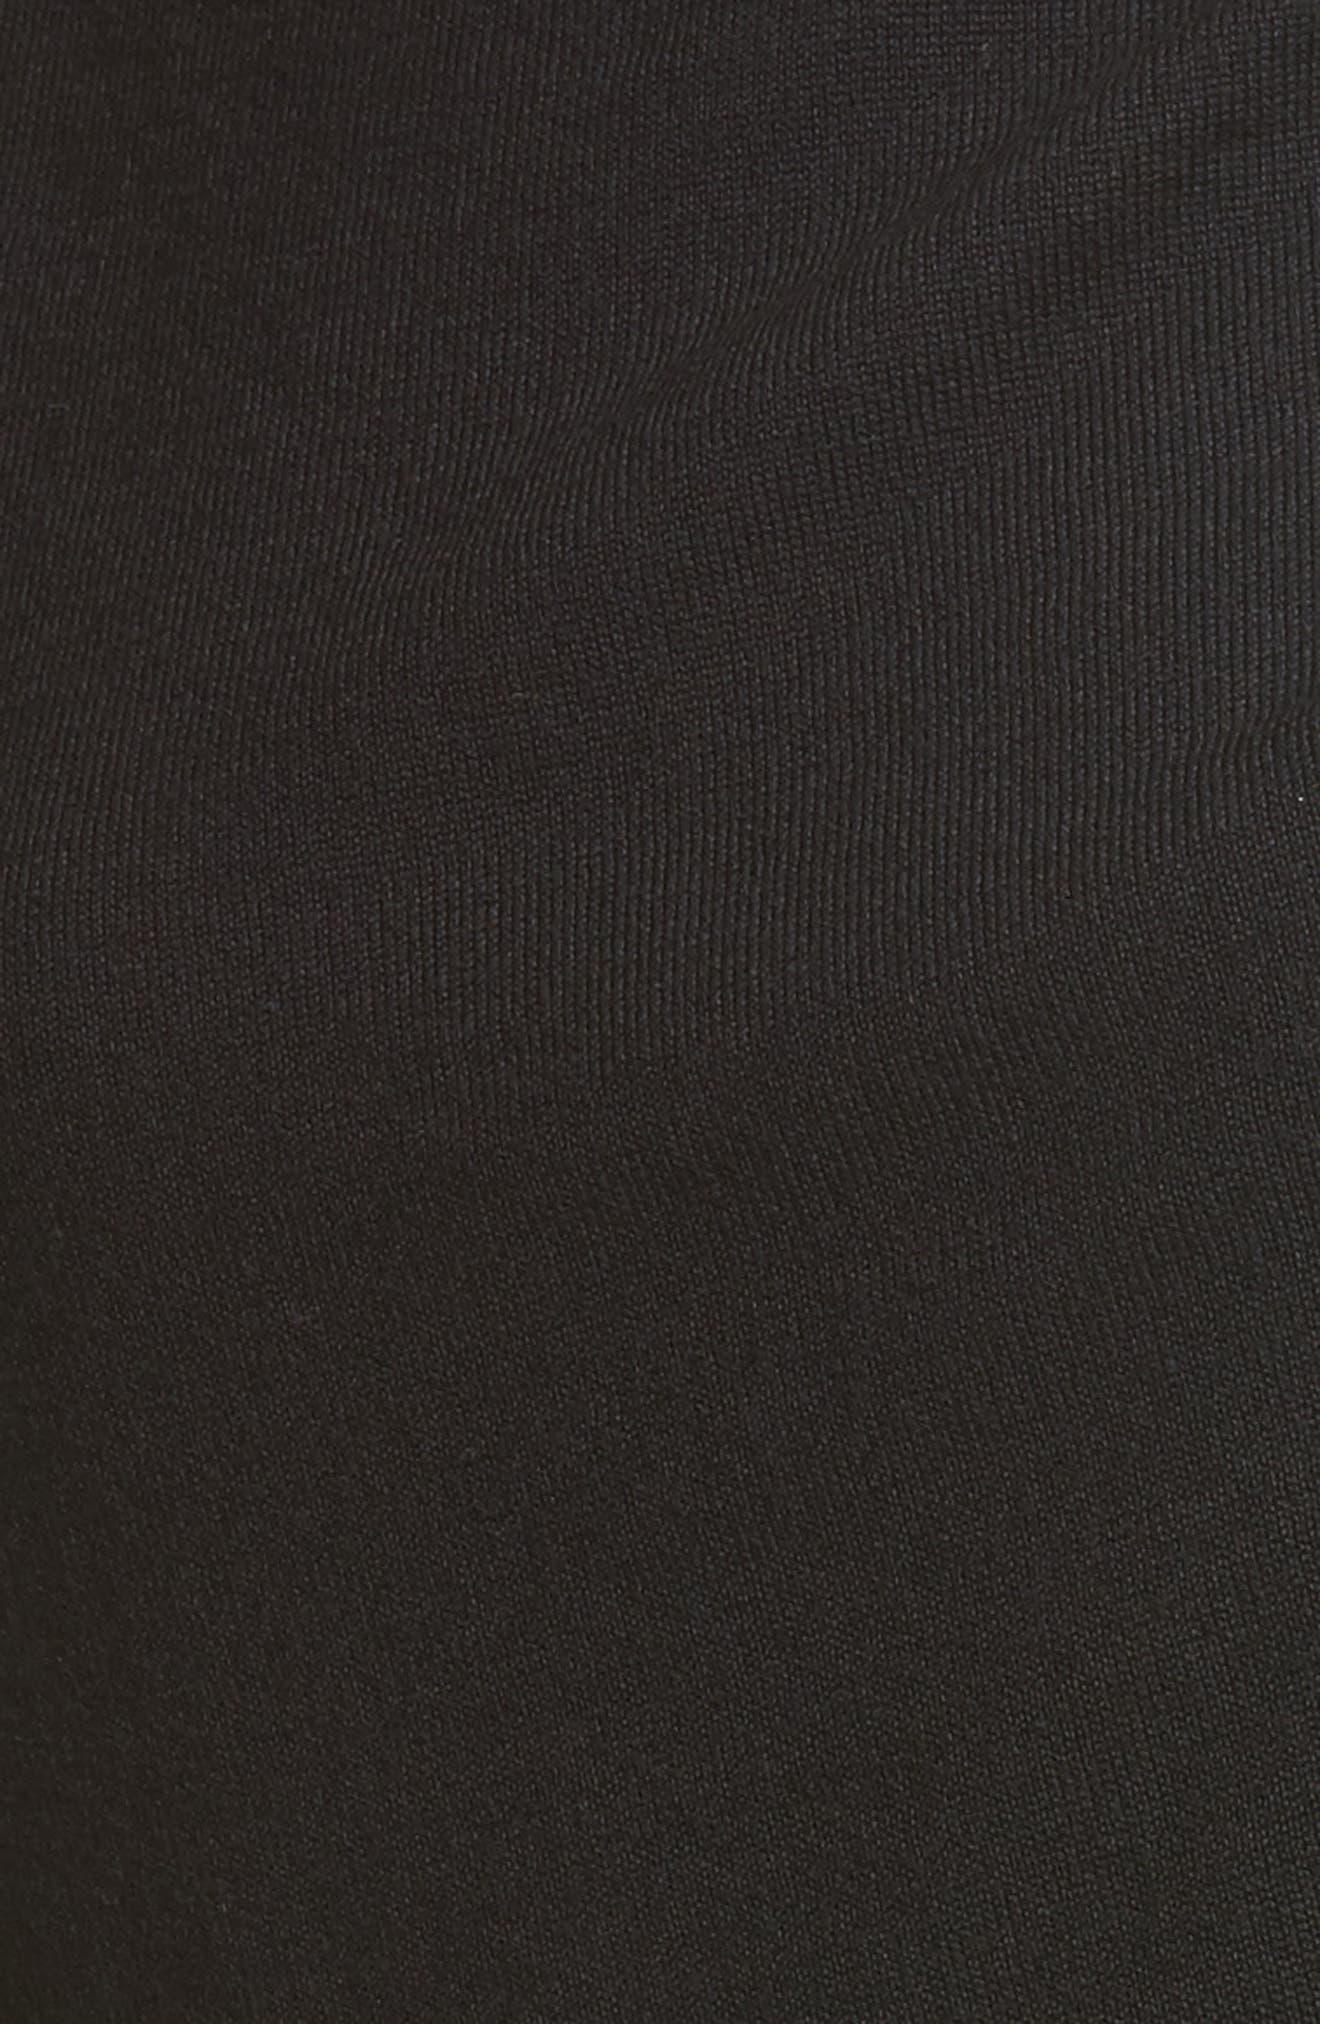 Merino Wool Sweater,                             Alternate thumbnail 5, color,                             001